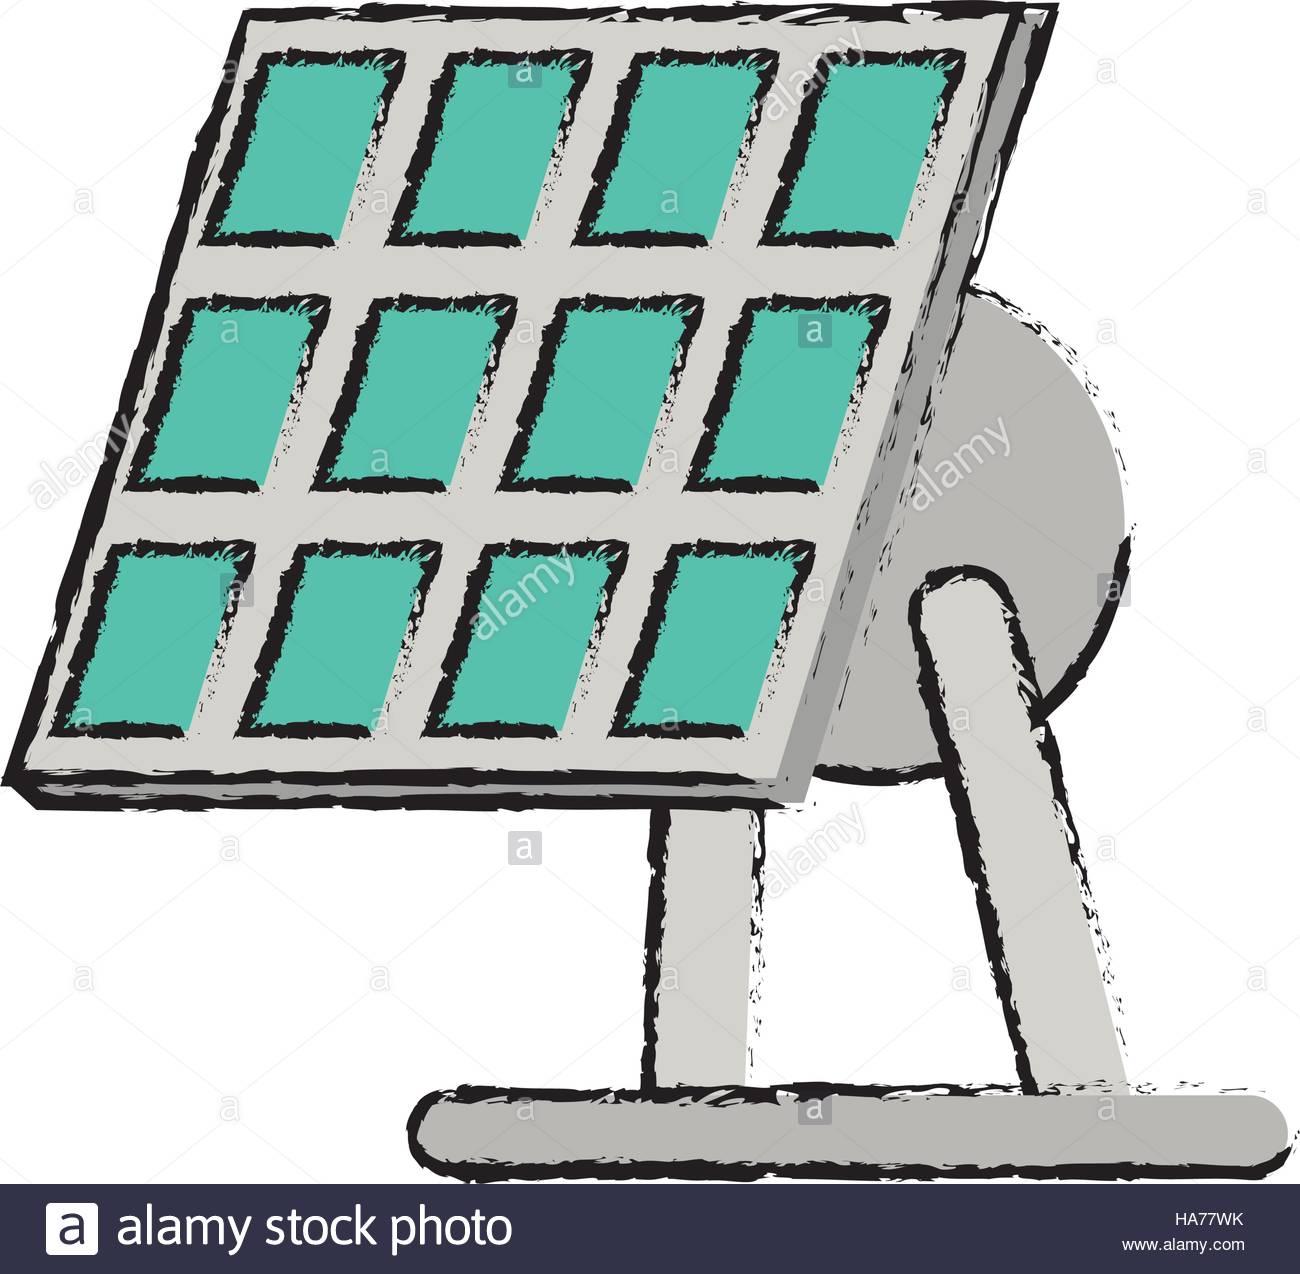 1300x1274 Drawn Solar Panel Renewable Energy Alternative Stock Vector Art